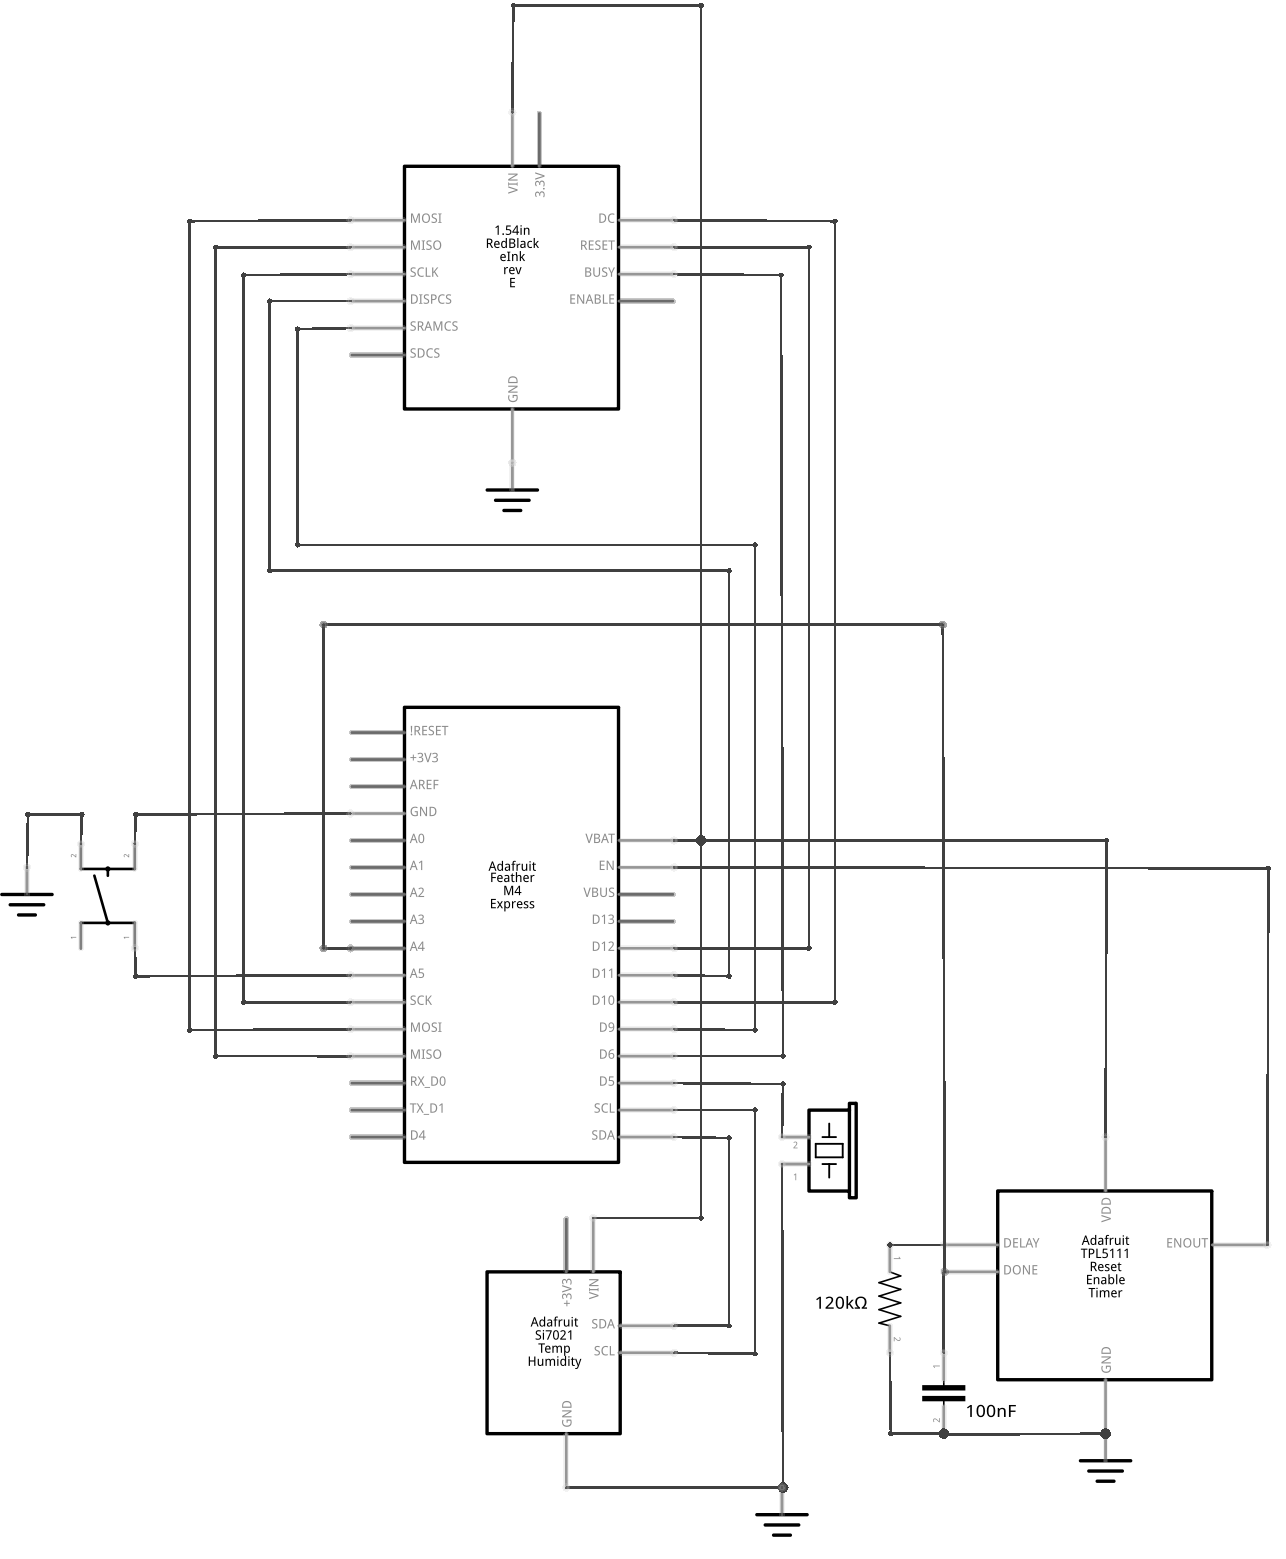 temperature___humidity_wiring_schem.png